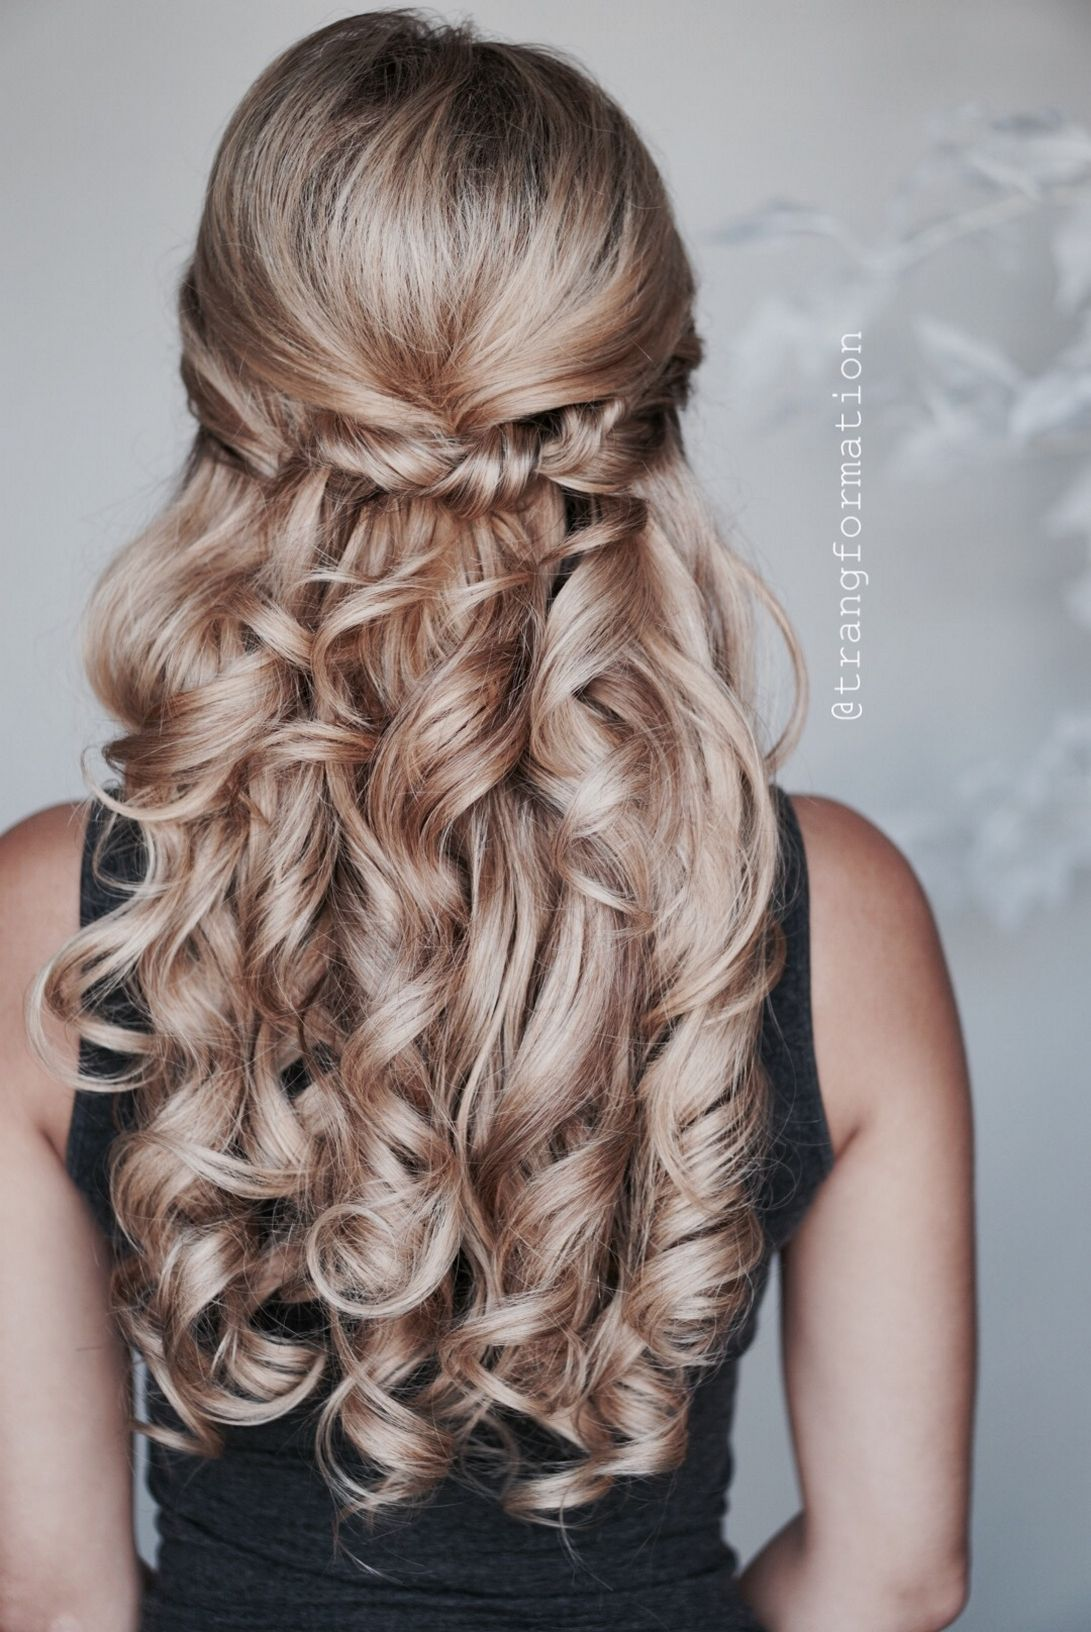 100 Gorgeous Half Up Half Down Hairstyles Ideas Down Hairstyles Down Hairstyles For Long Hair Hair Styles